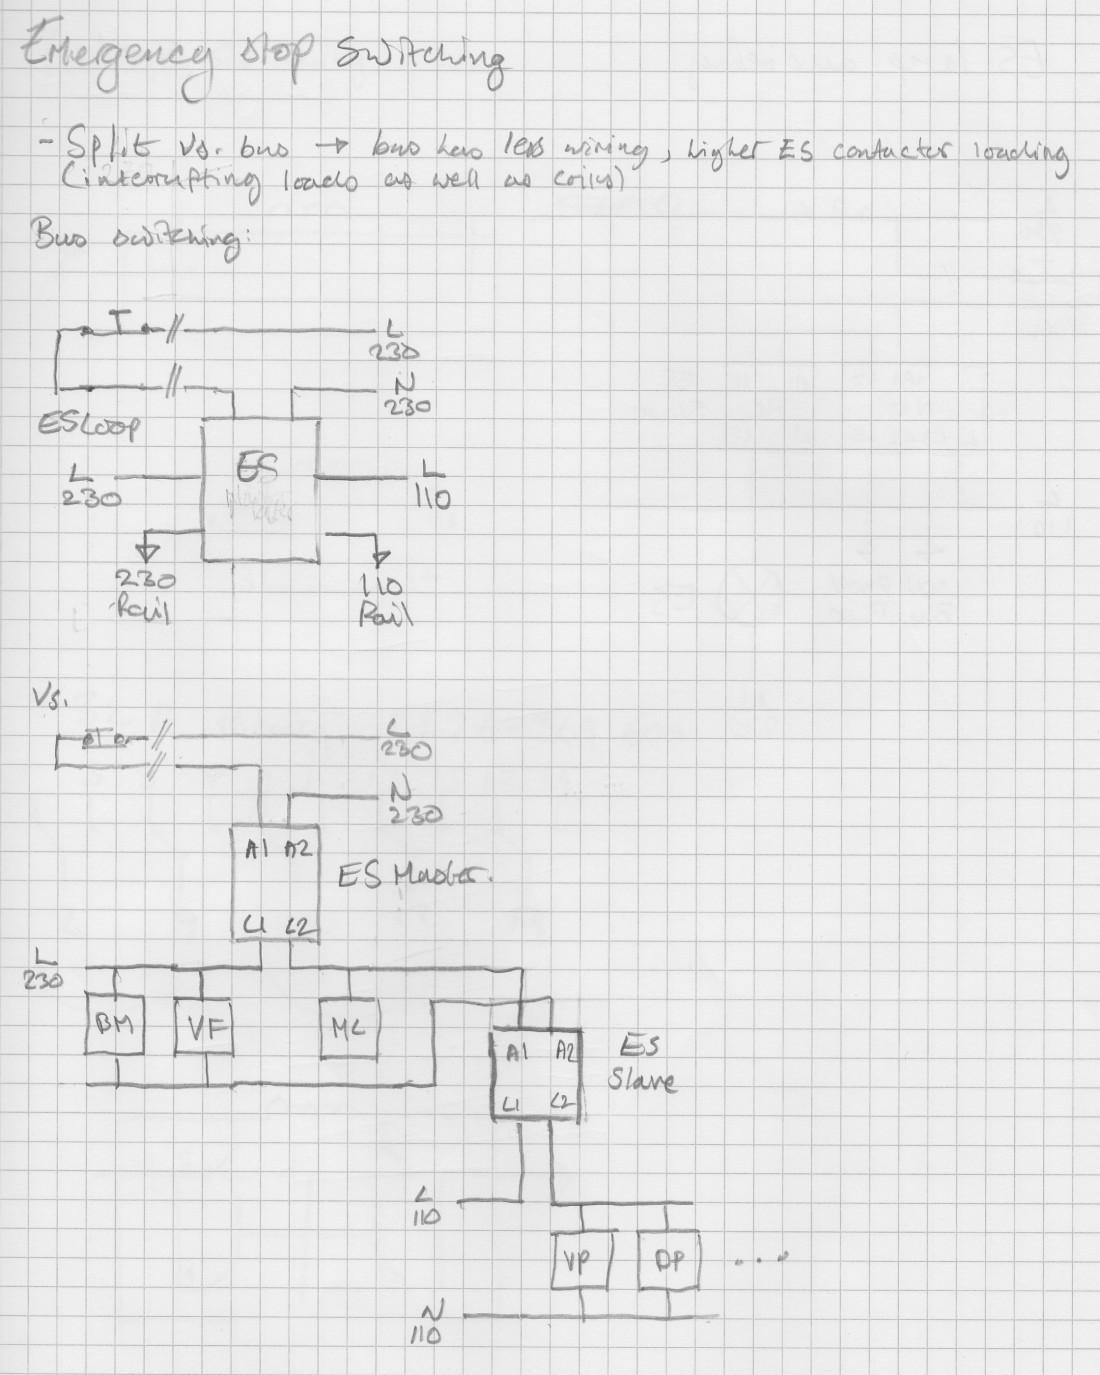 Control Freak Bmrs Neon Blog Estop Relay Wiring Diagram Emergency Stop Switching 1